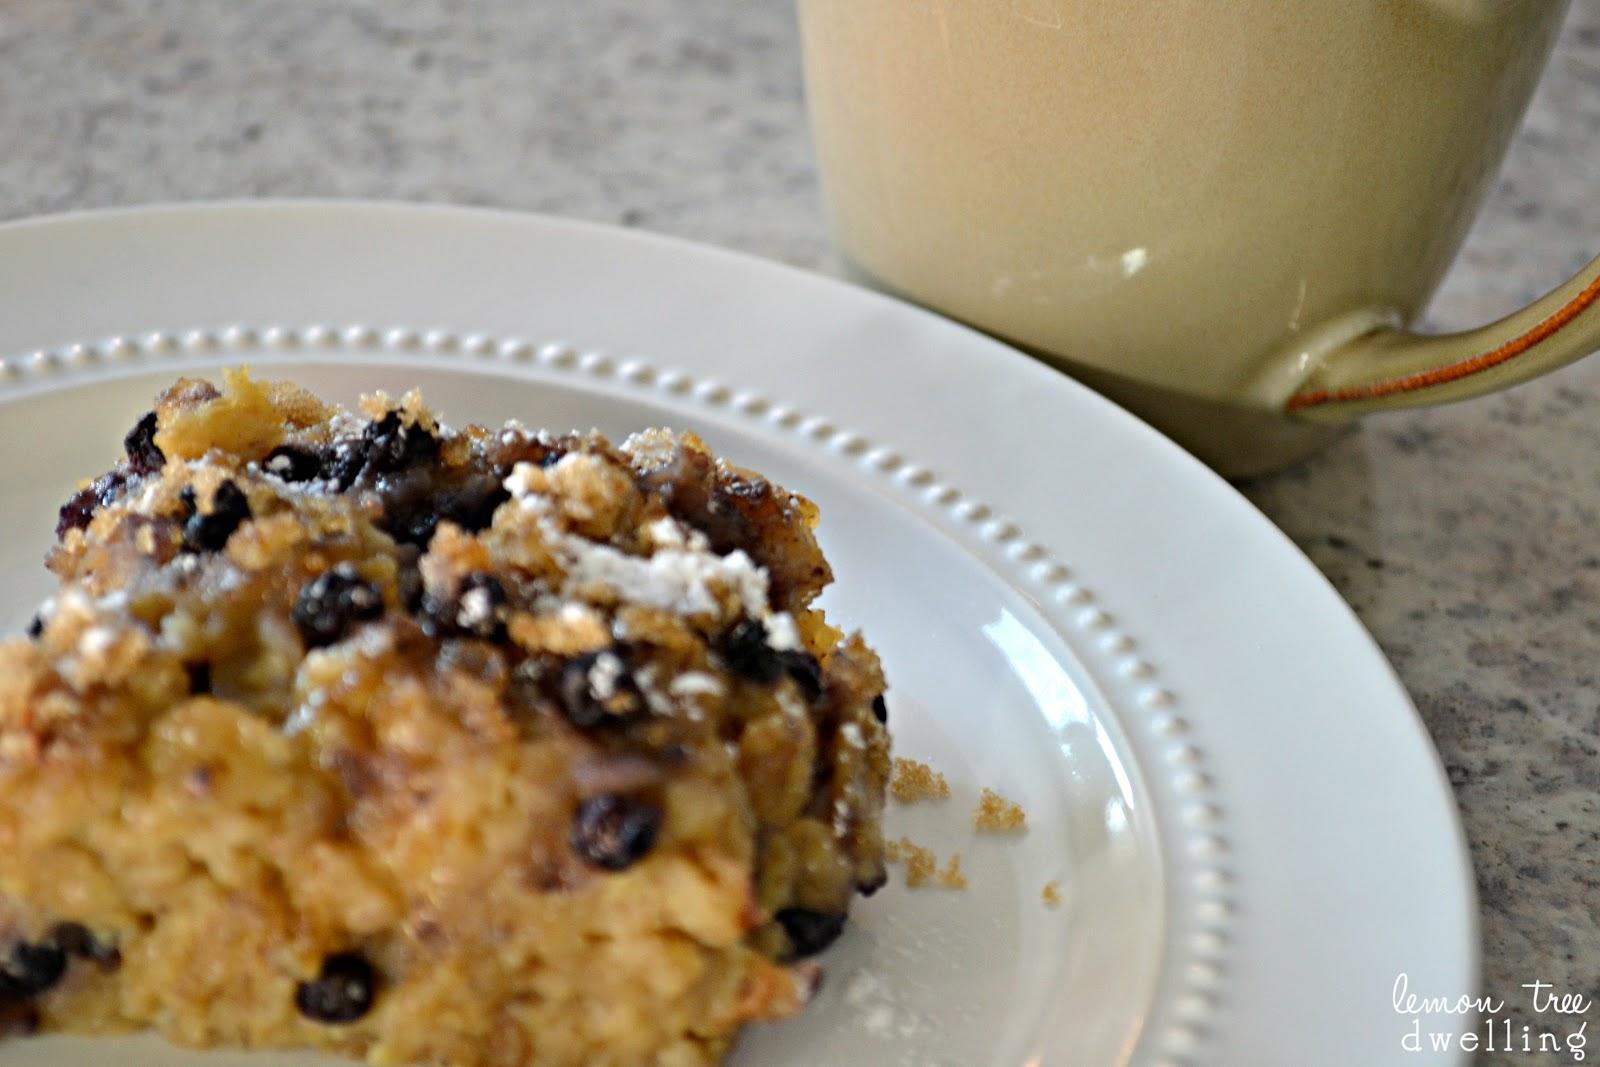 Lemon Tree Dwelling: Baked Blueberry Oatmeal